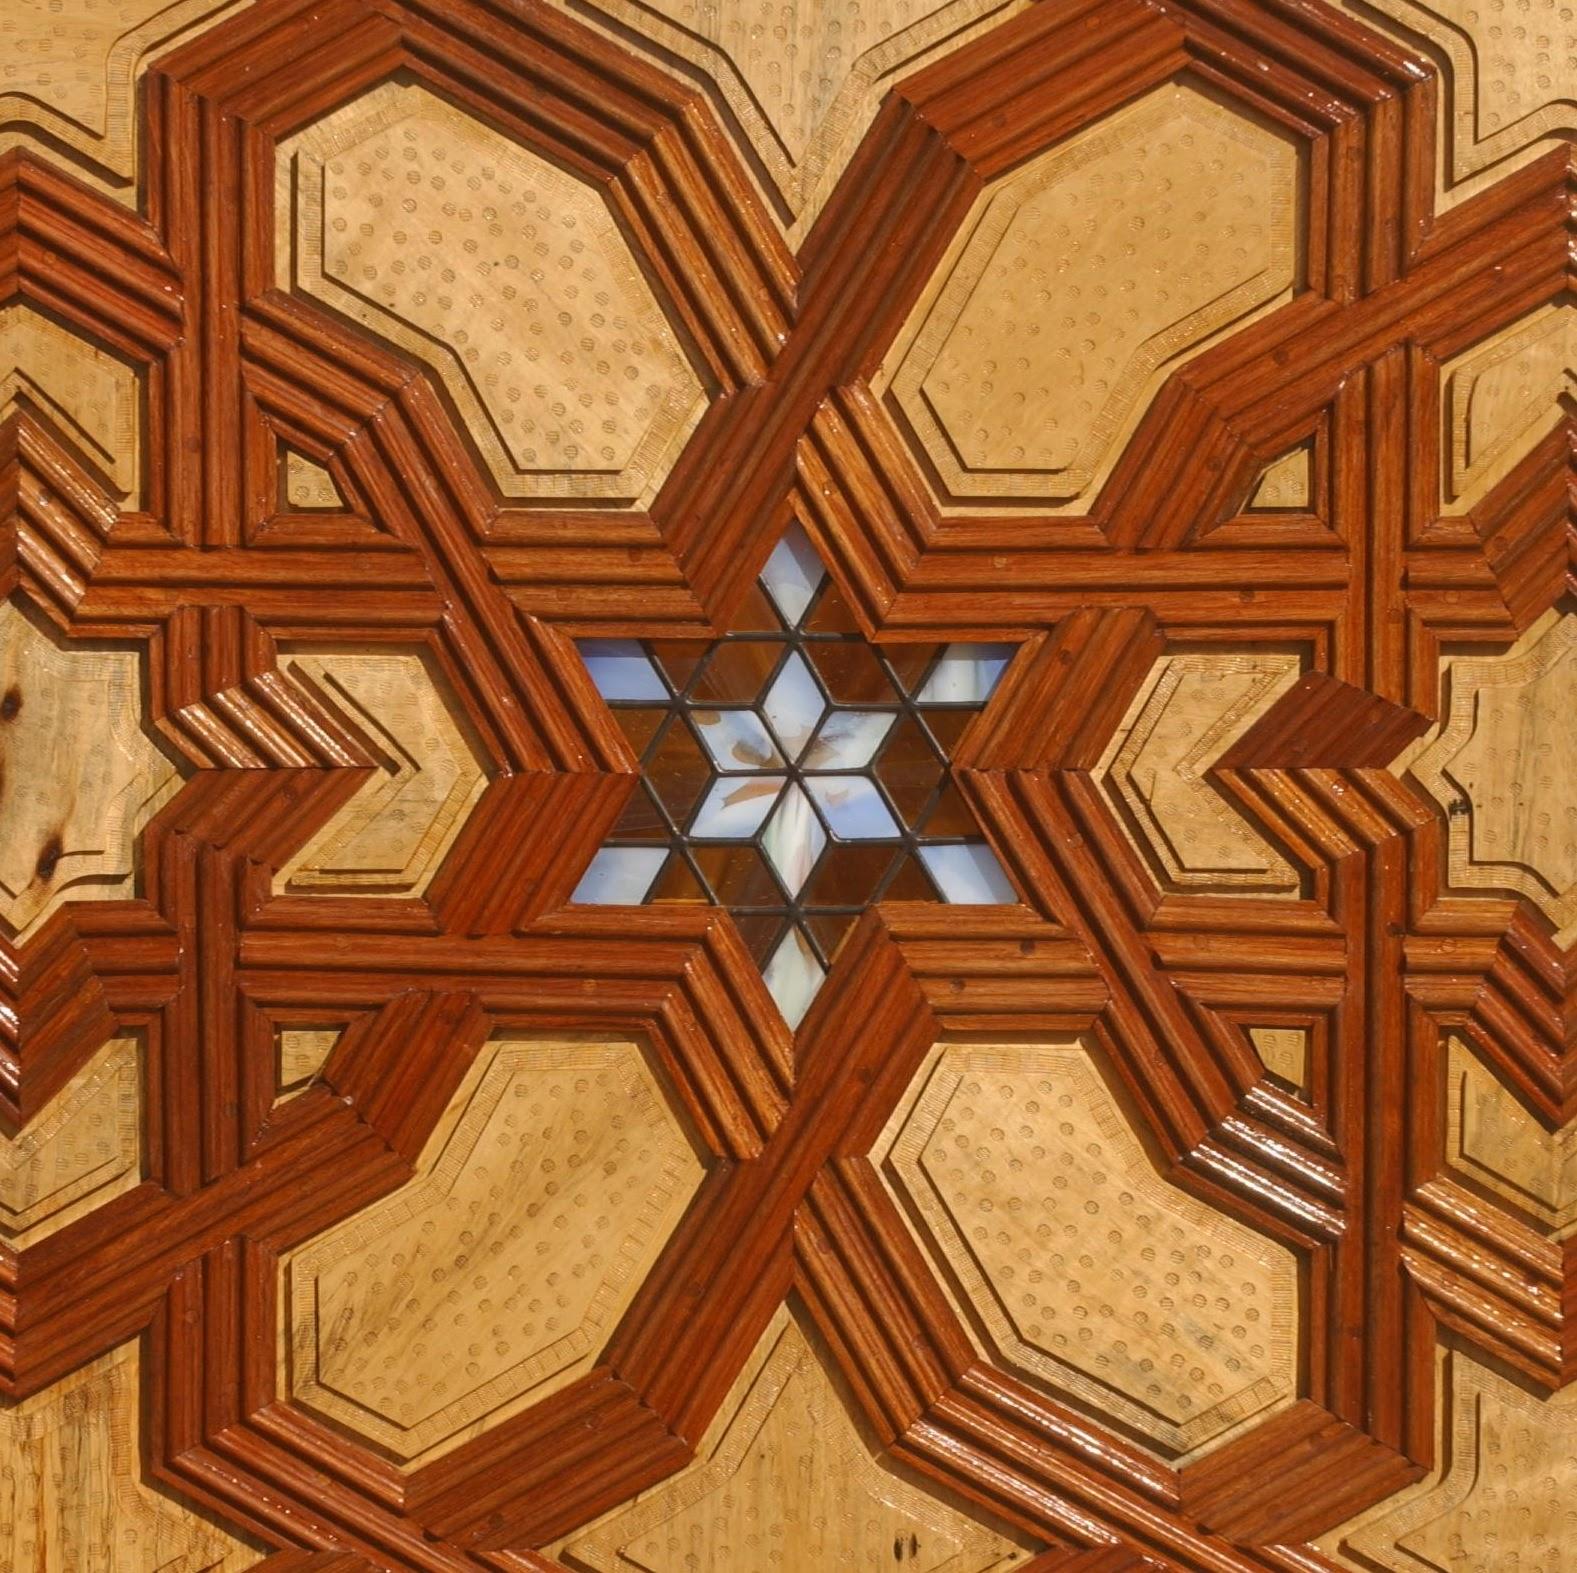 07-Synagogue Door detail.jpg